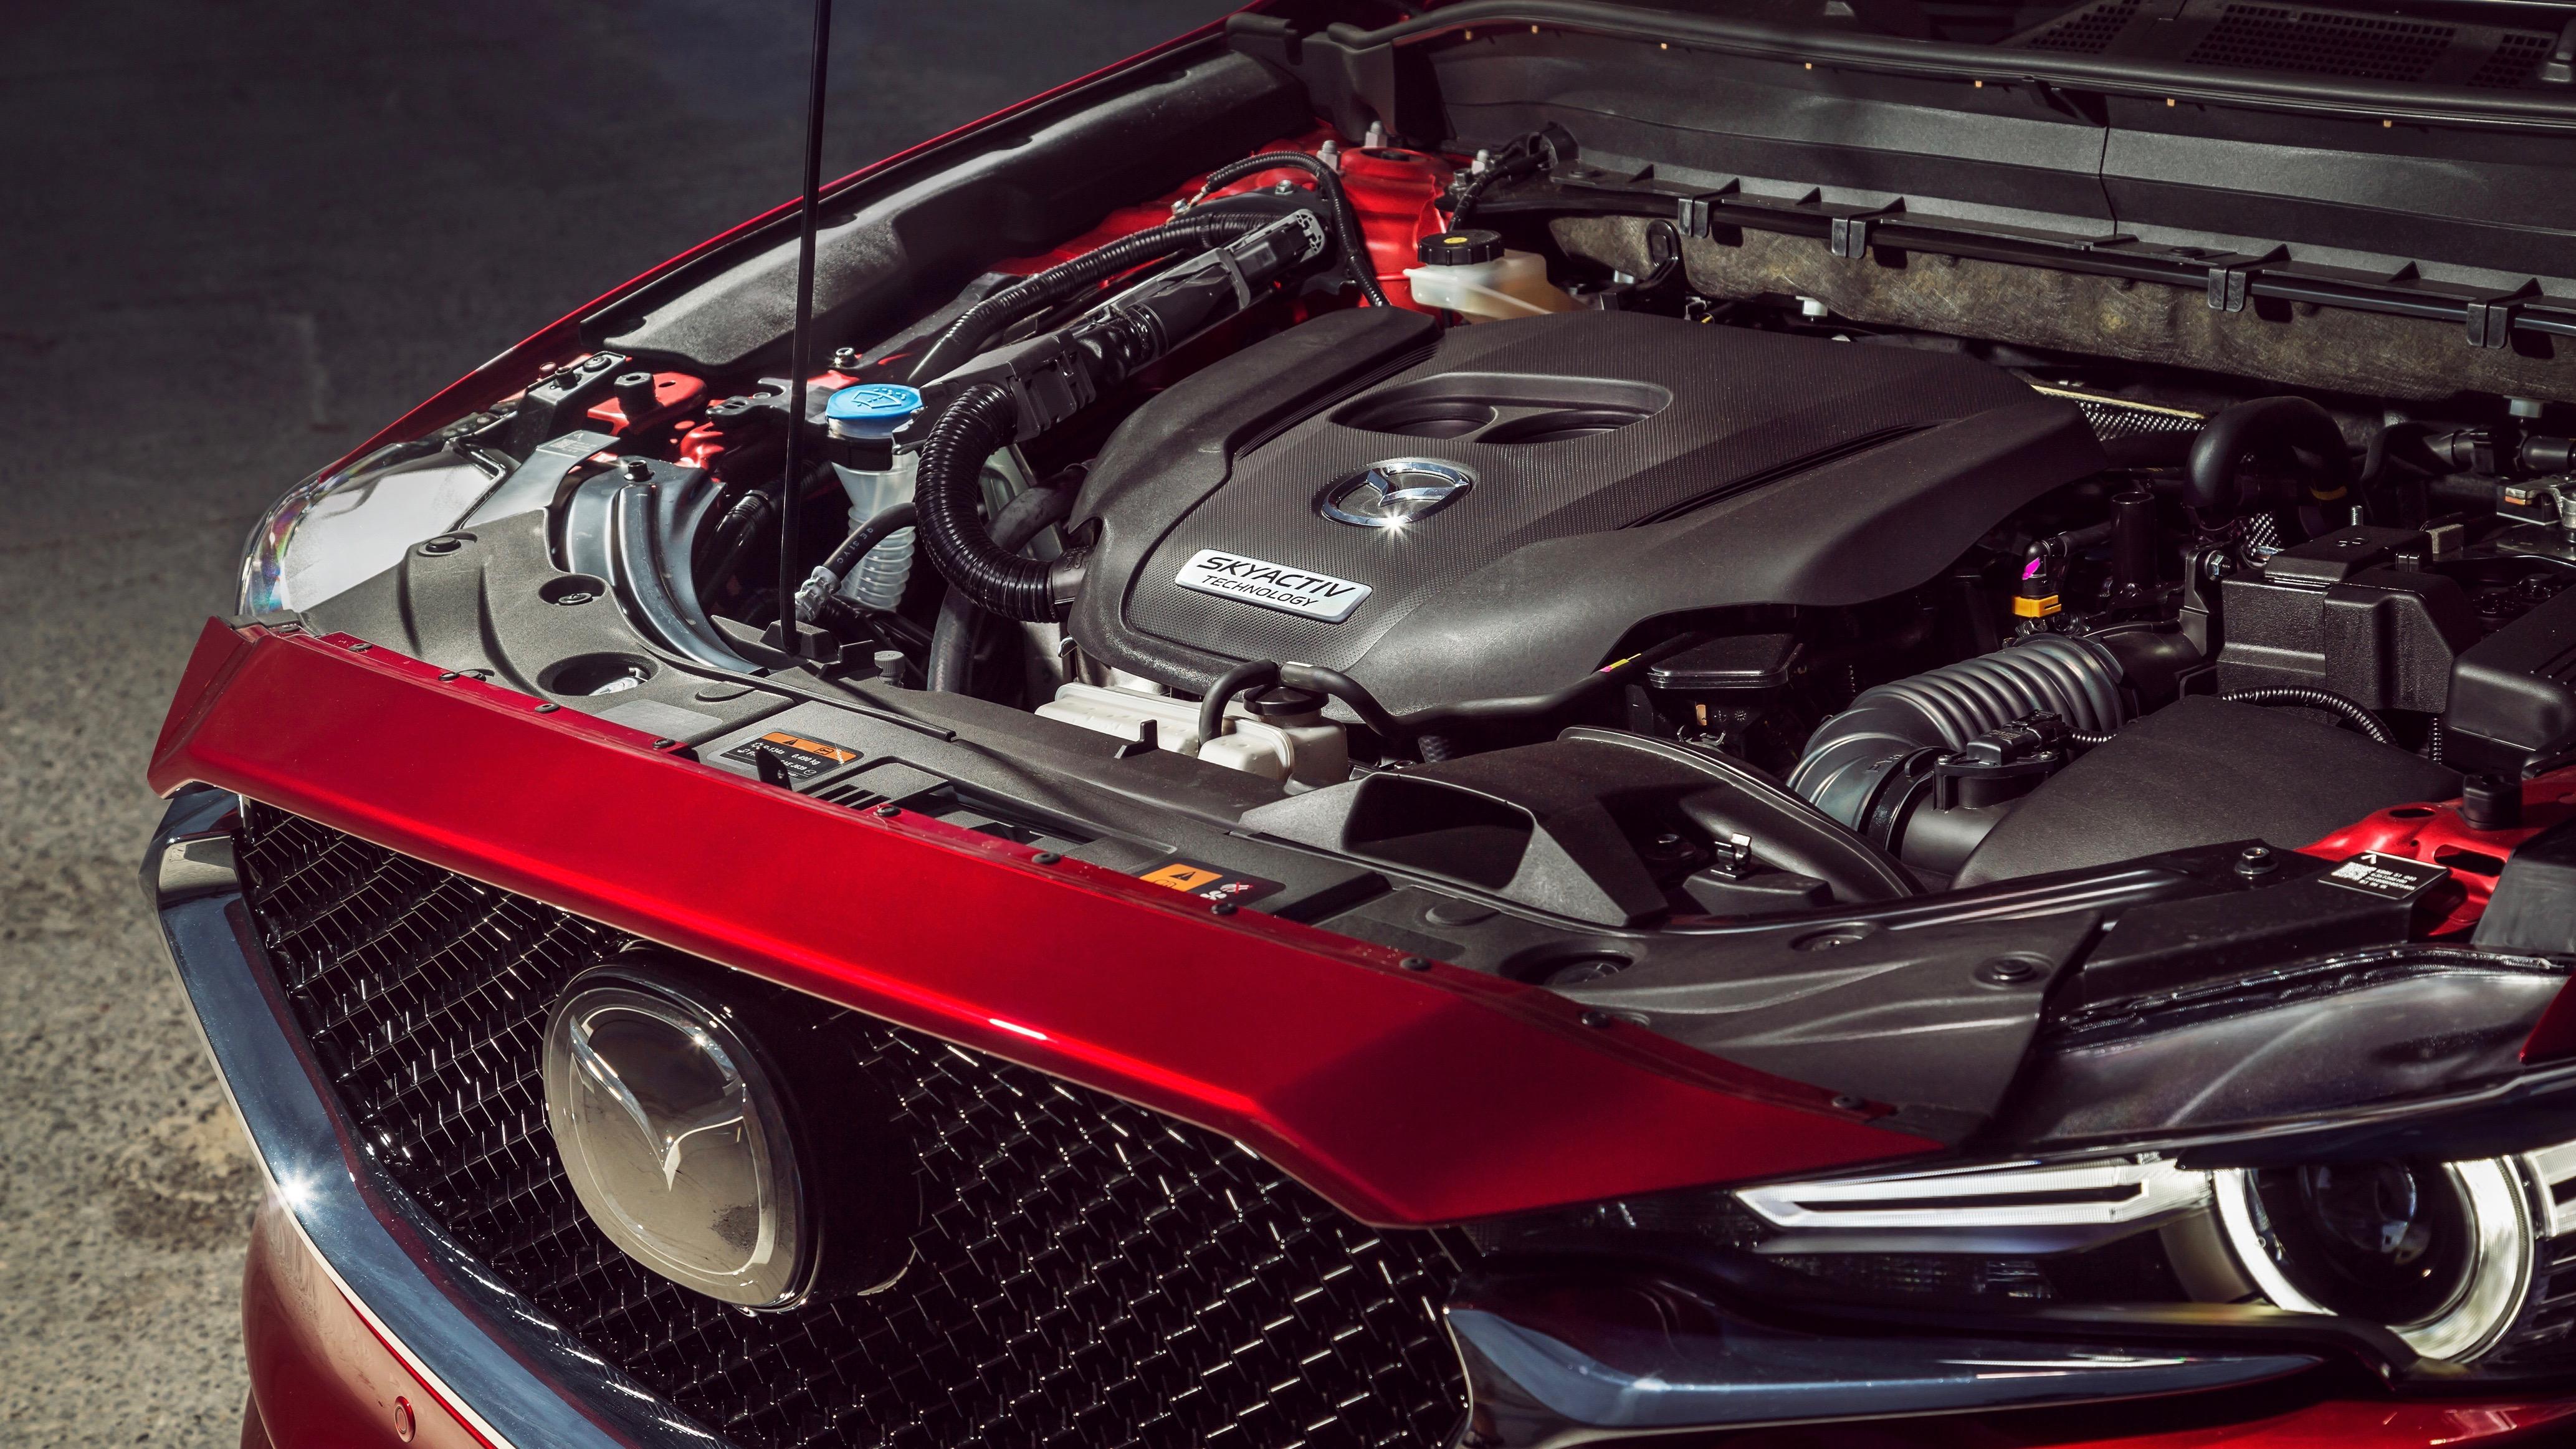 2019 Mazda CX-5 turbo engine